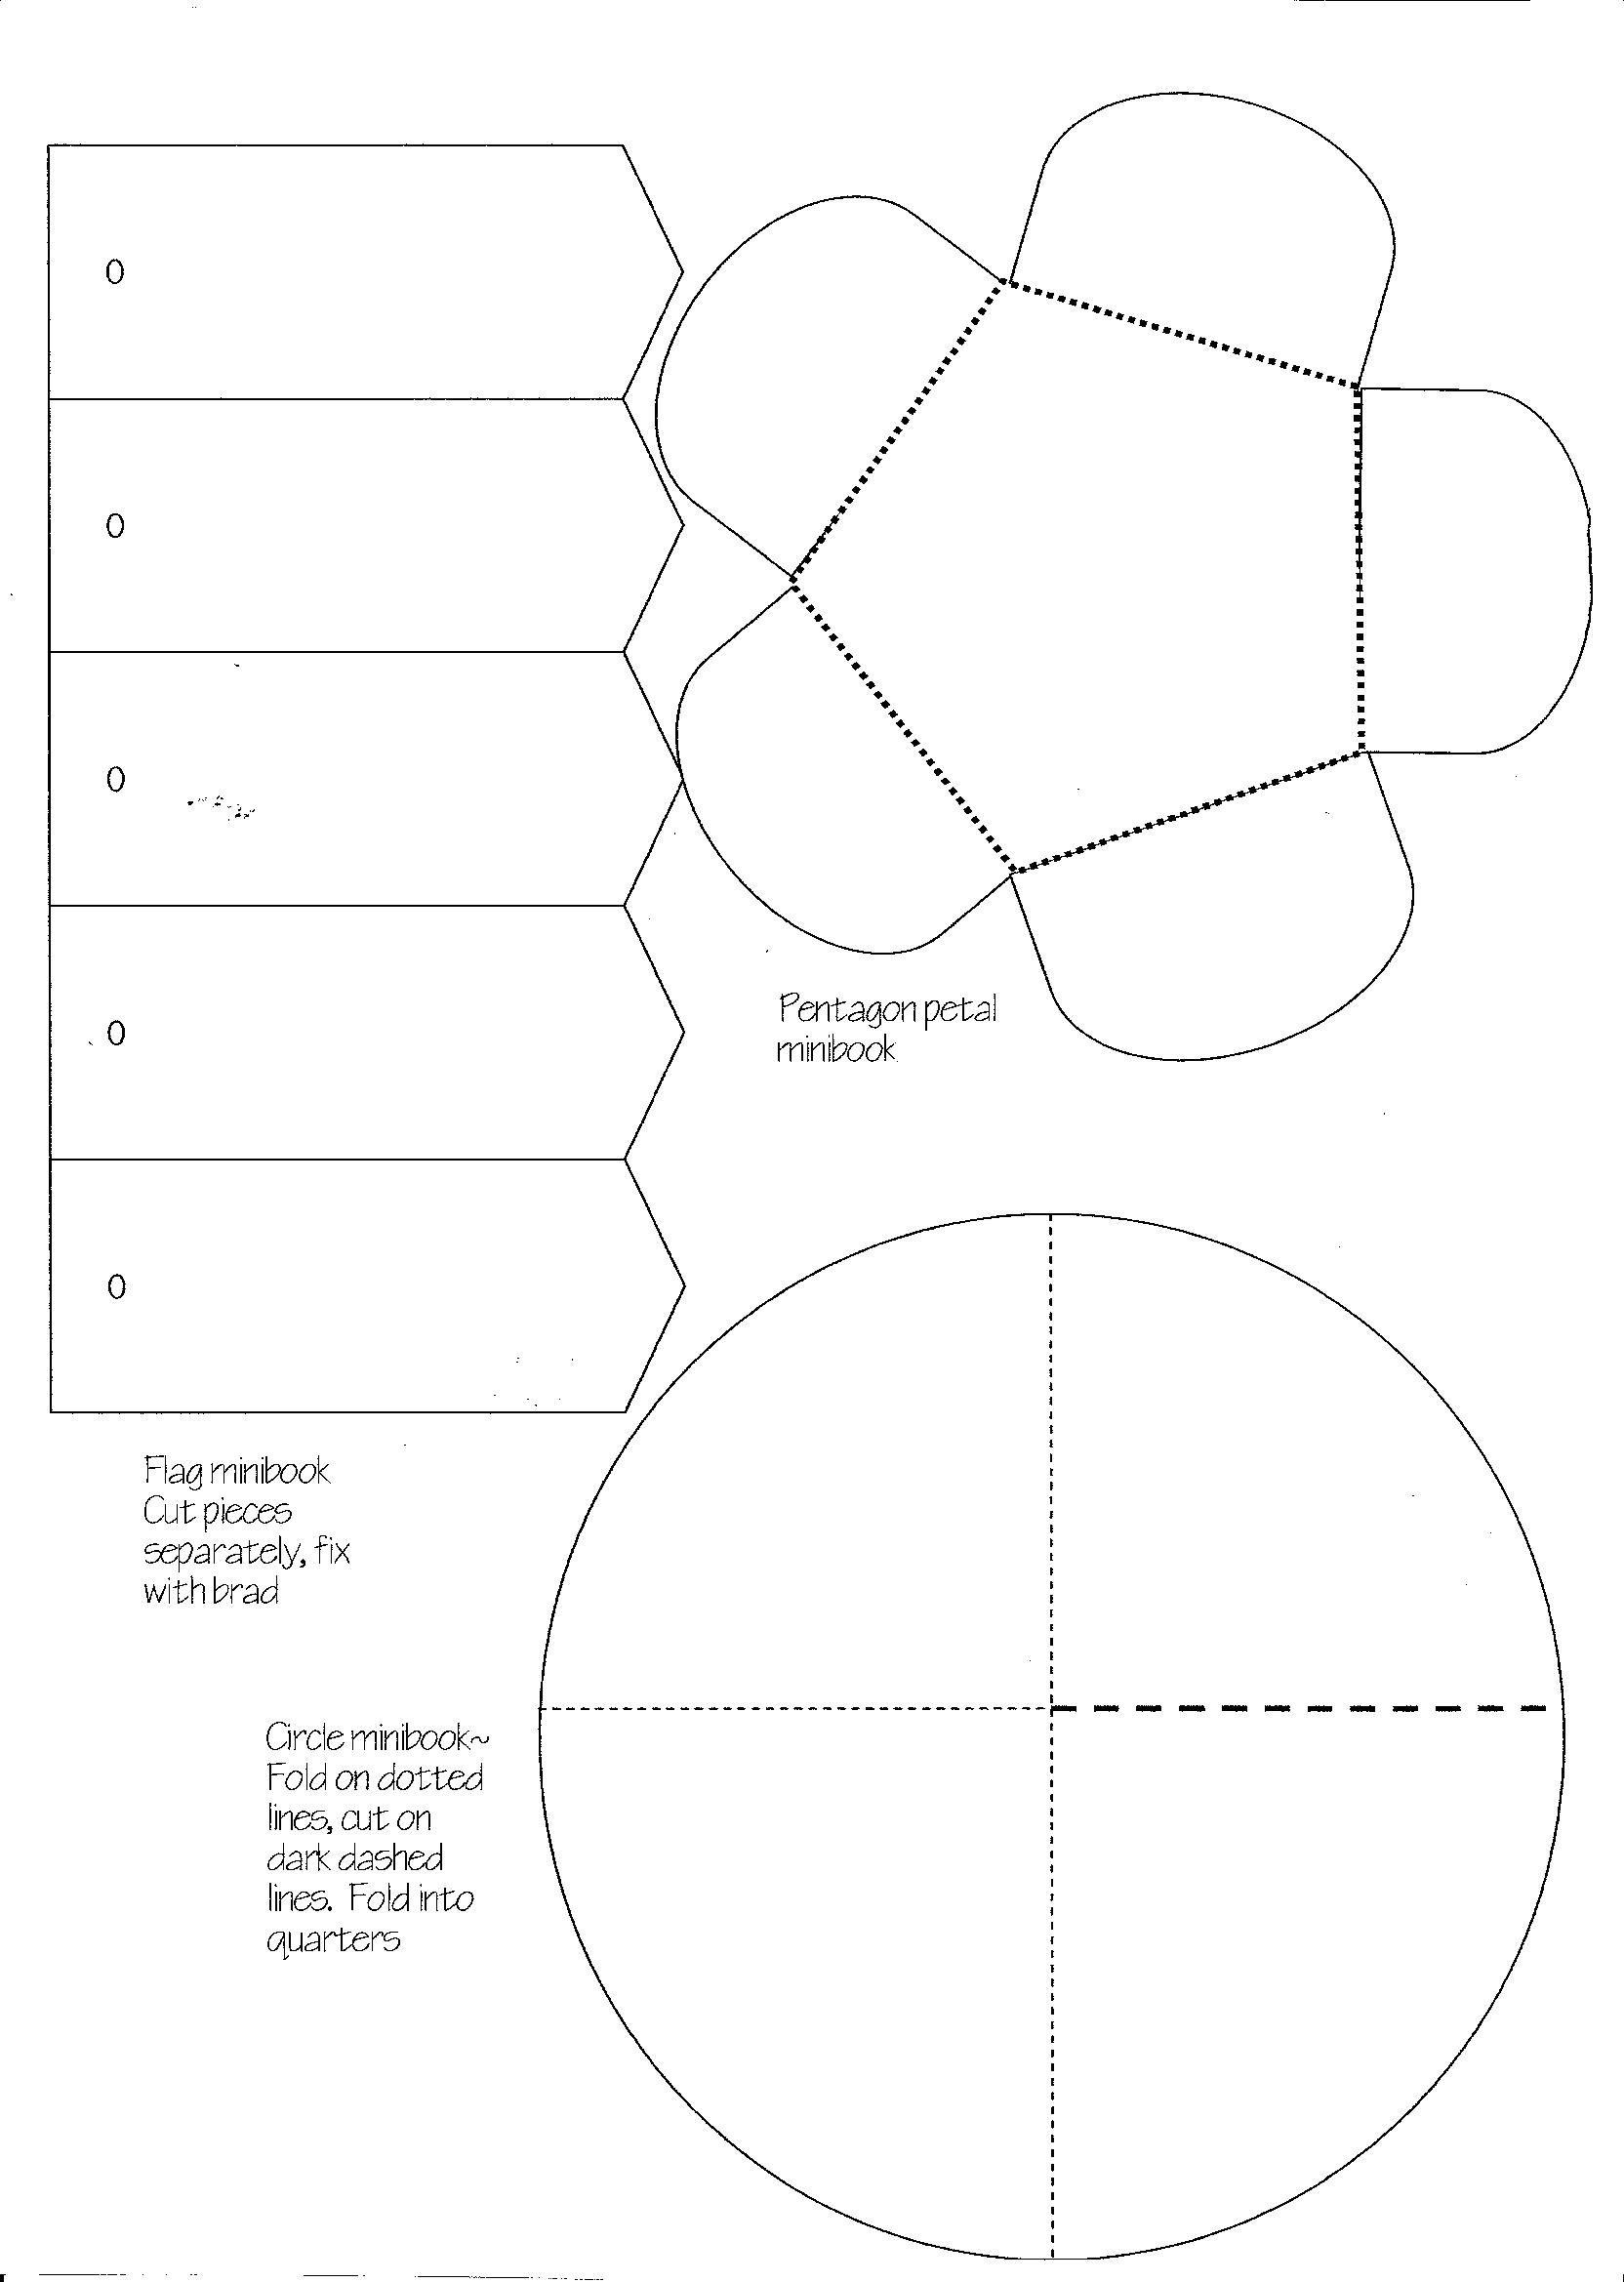 Minibook Master Template Download   LAPBOOK   Pinterest ...